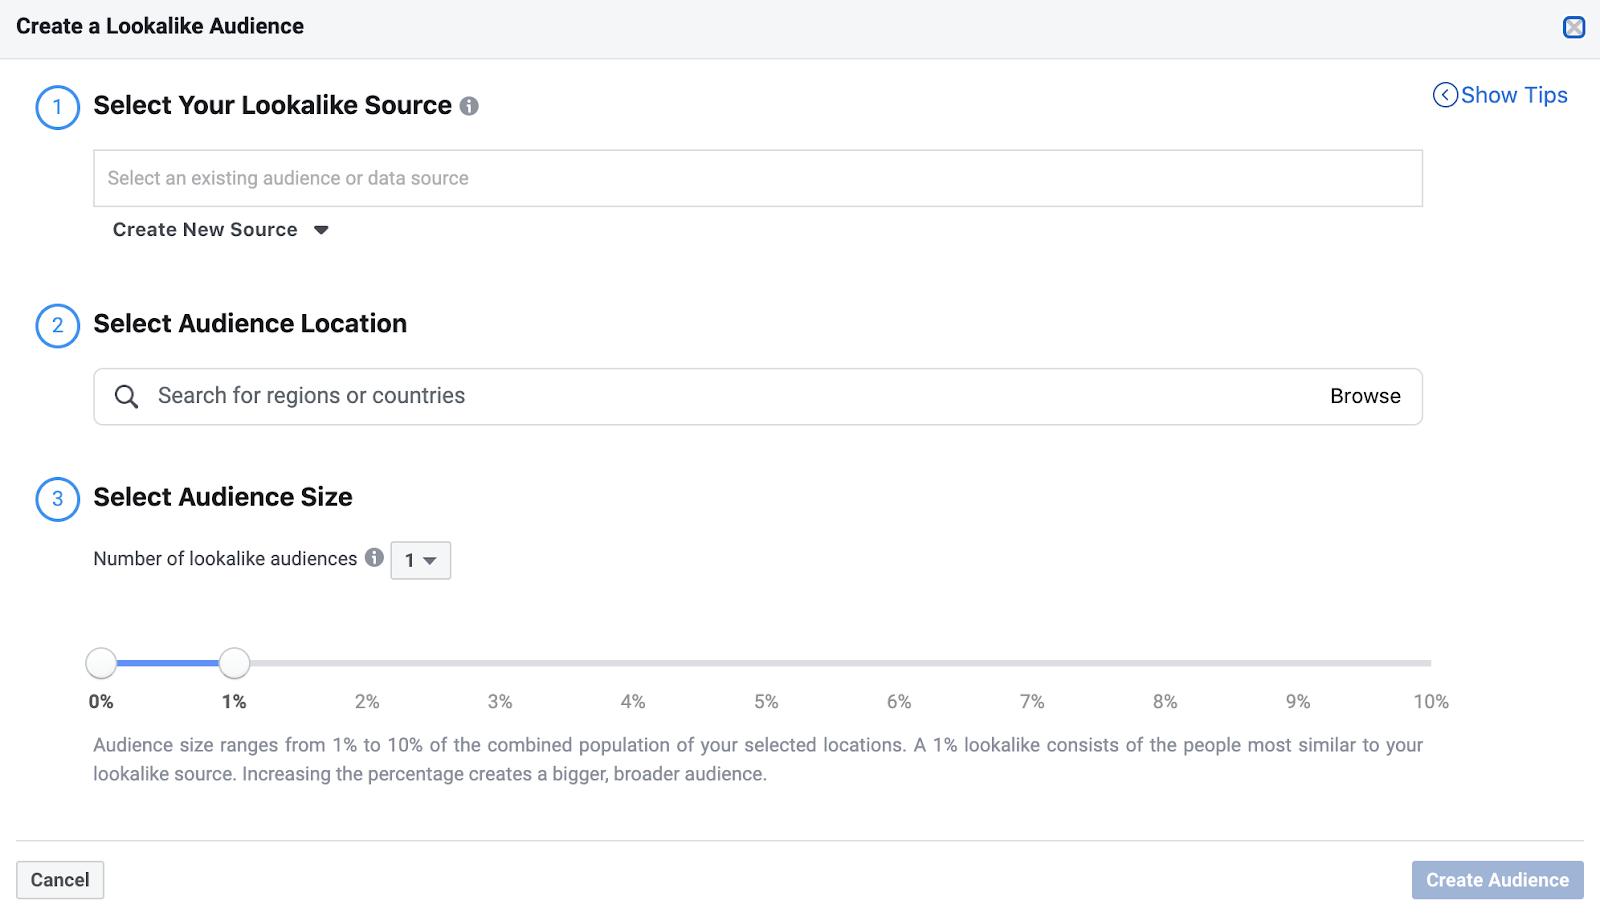 Create a Facebook Lookalike Audience